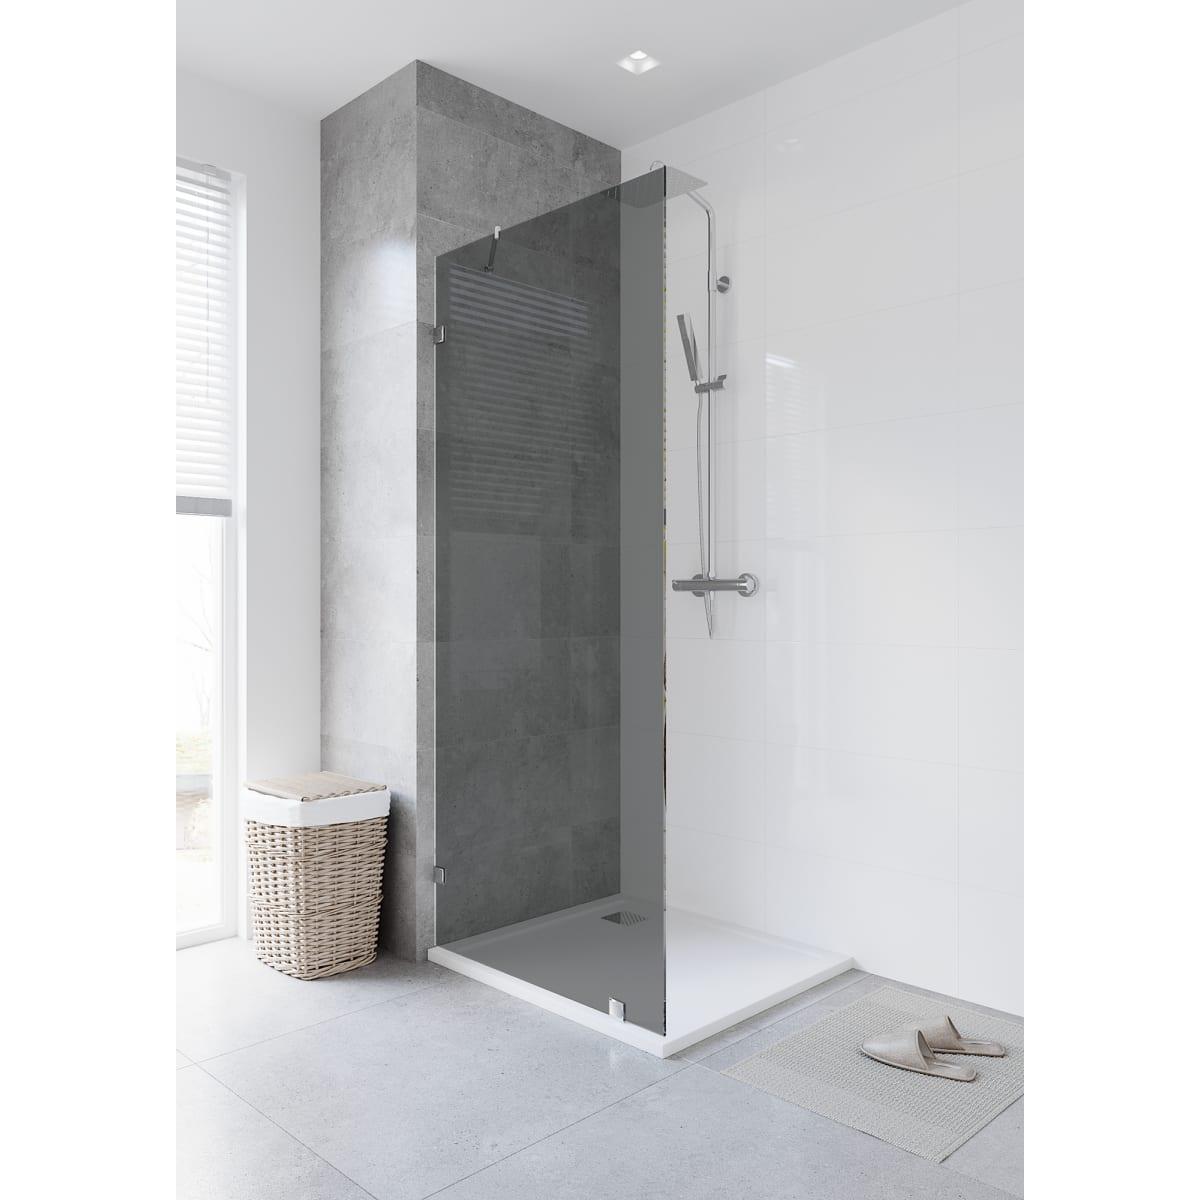 Панель боковая «Тон 90 Комфорт» 195х90 см